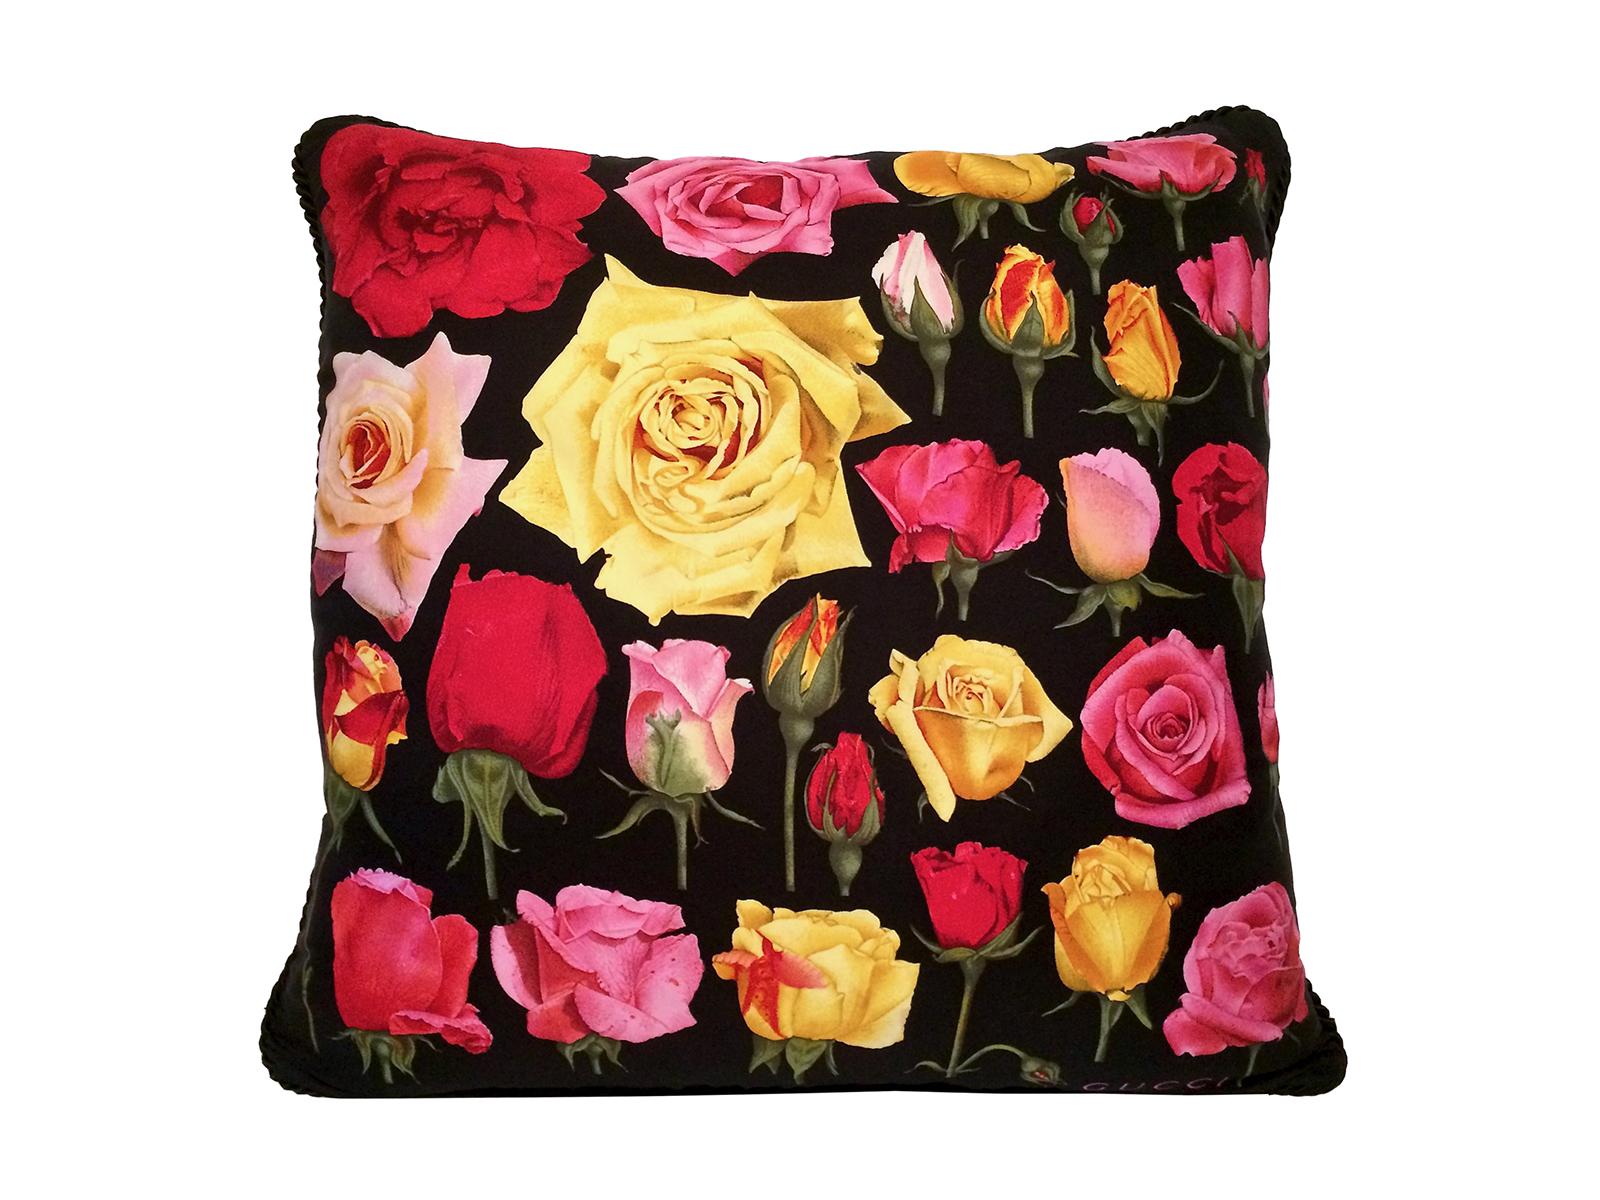 gucci roses pillow multi benton art design